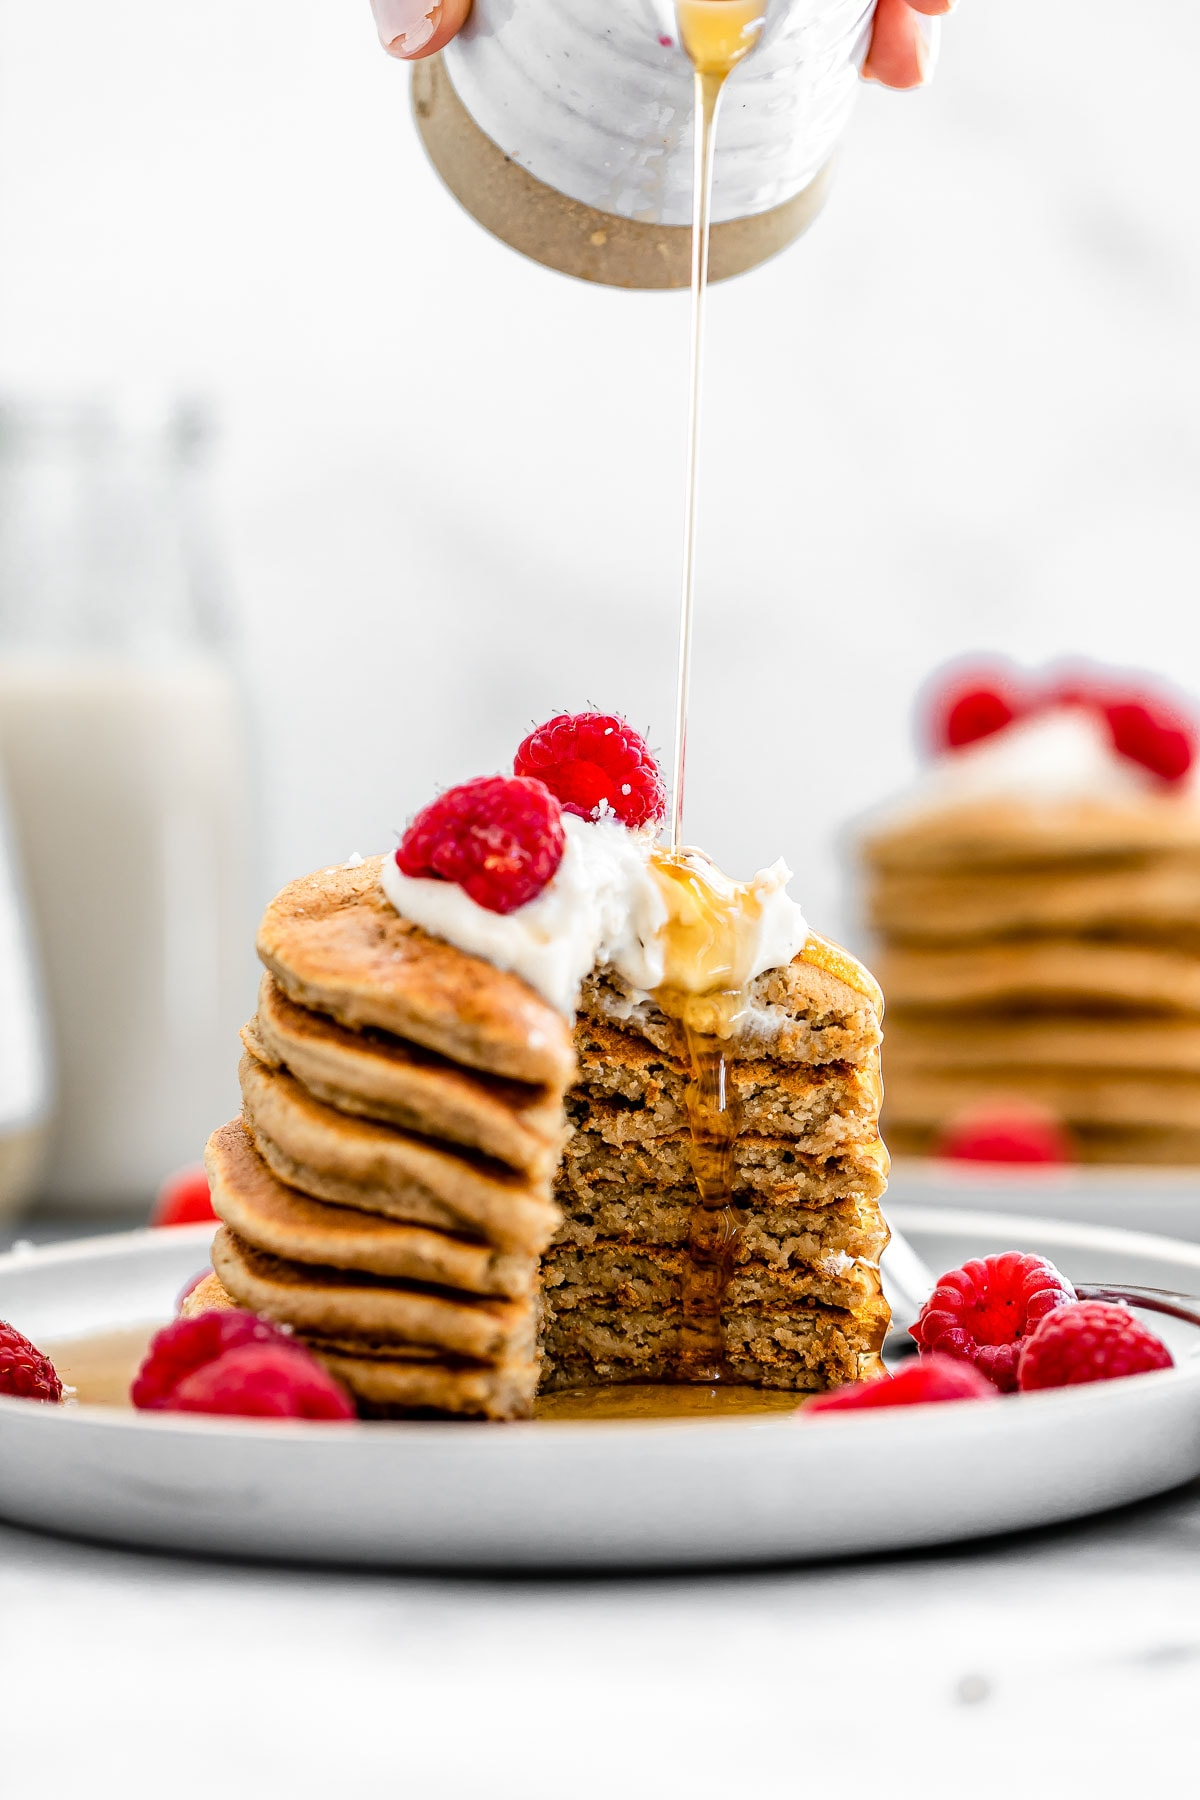 Vegan gluten free pancakes cut to show the texture.